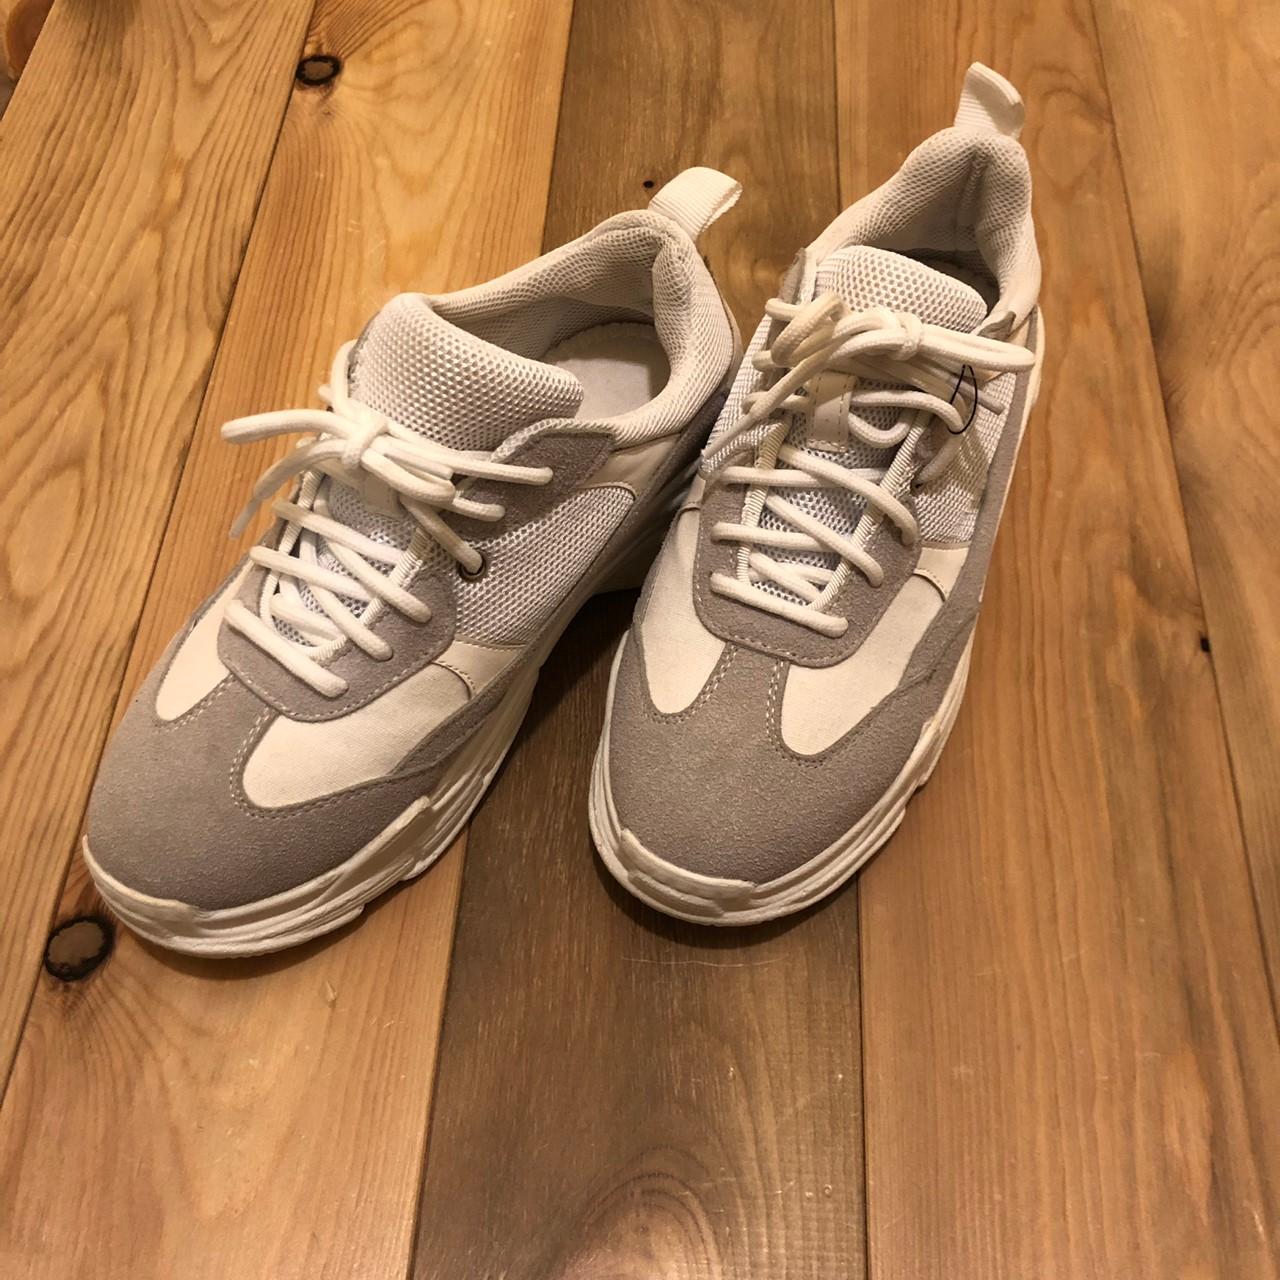 Dadd sneakers